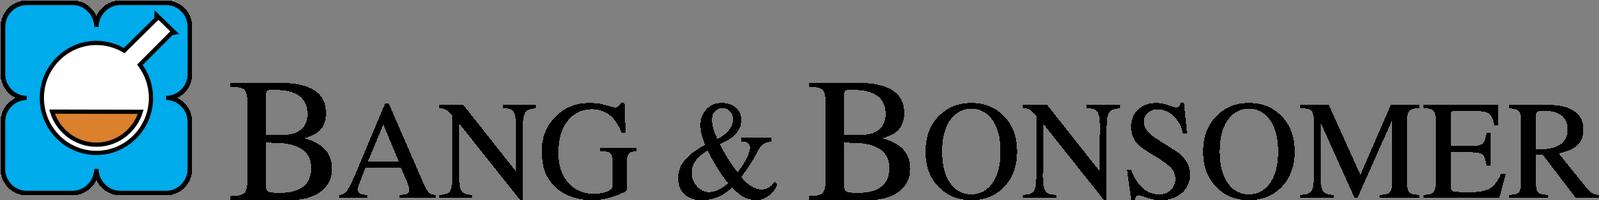 175-1753889_bang-bonsomer-logo-png-transparent-bang-bonsomer